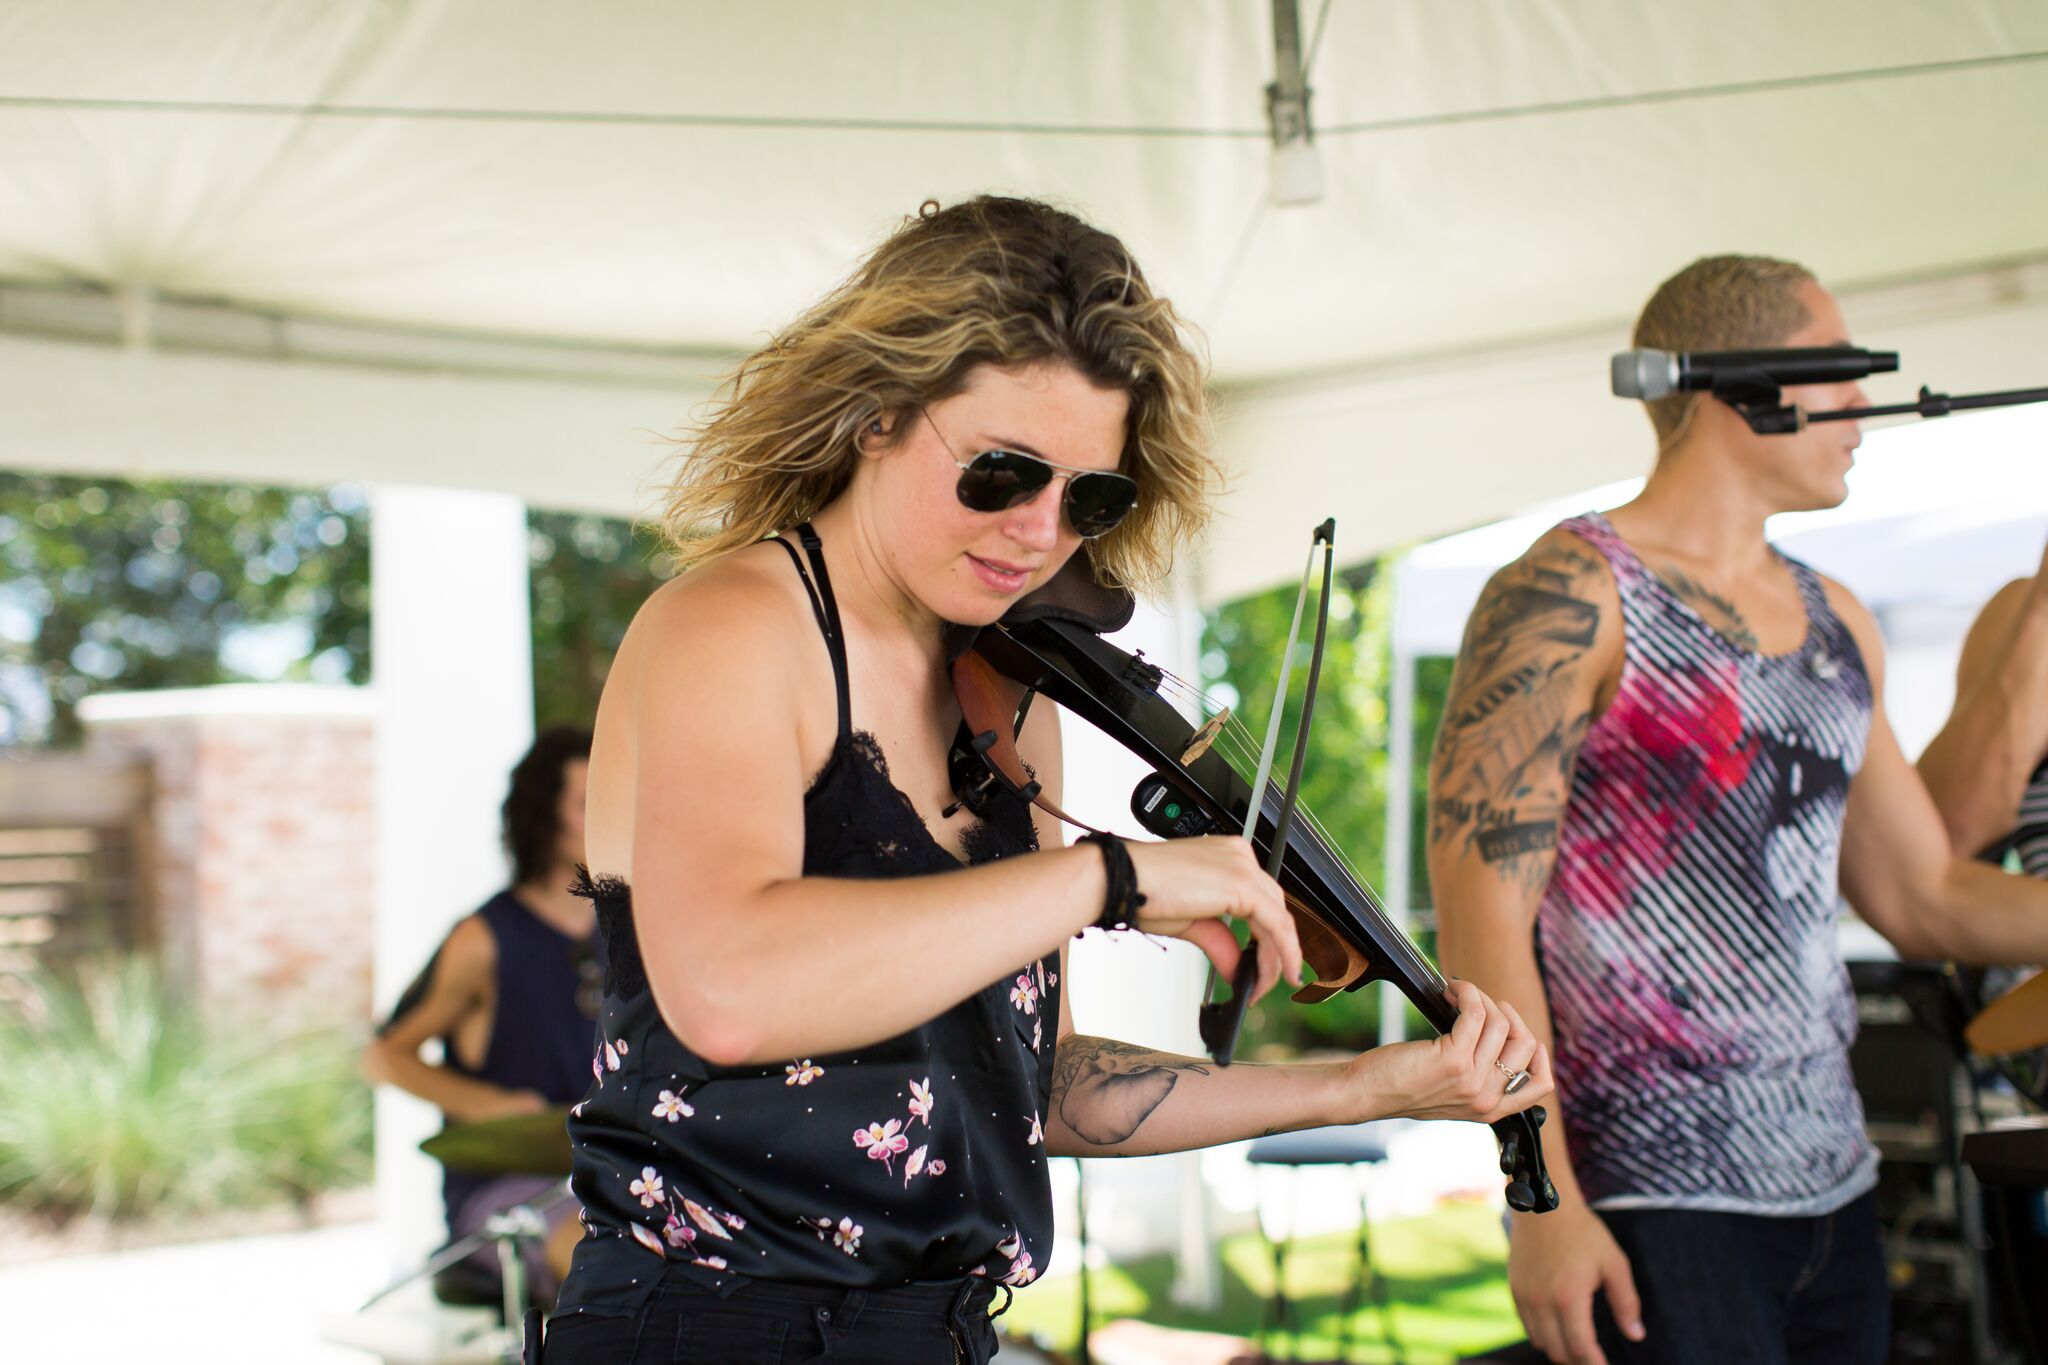 Sweet Sunday Event Raises $3,000